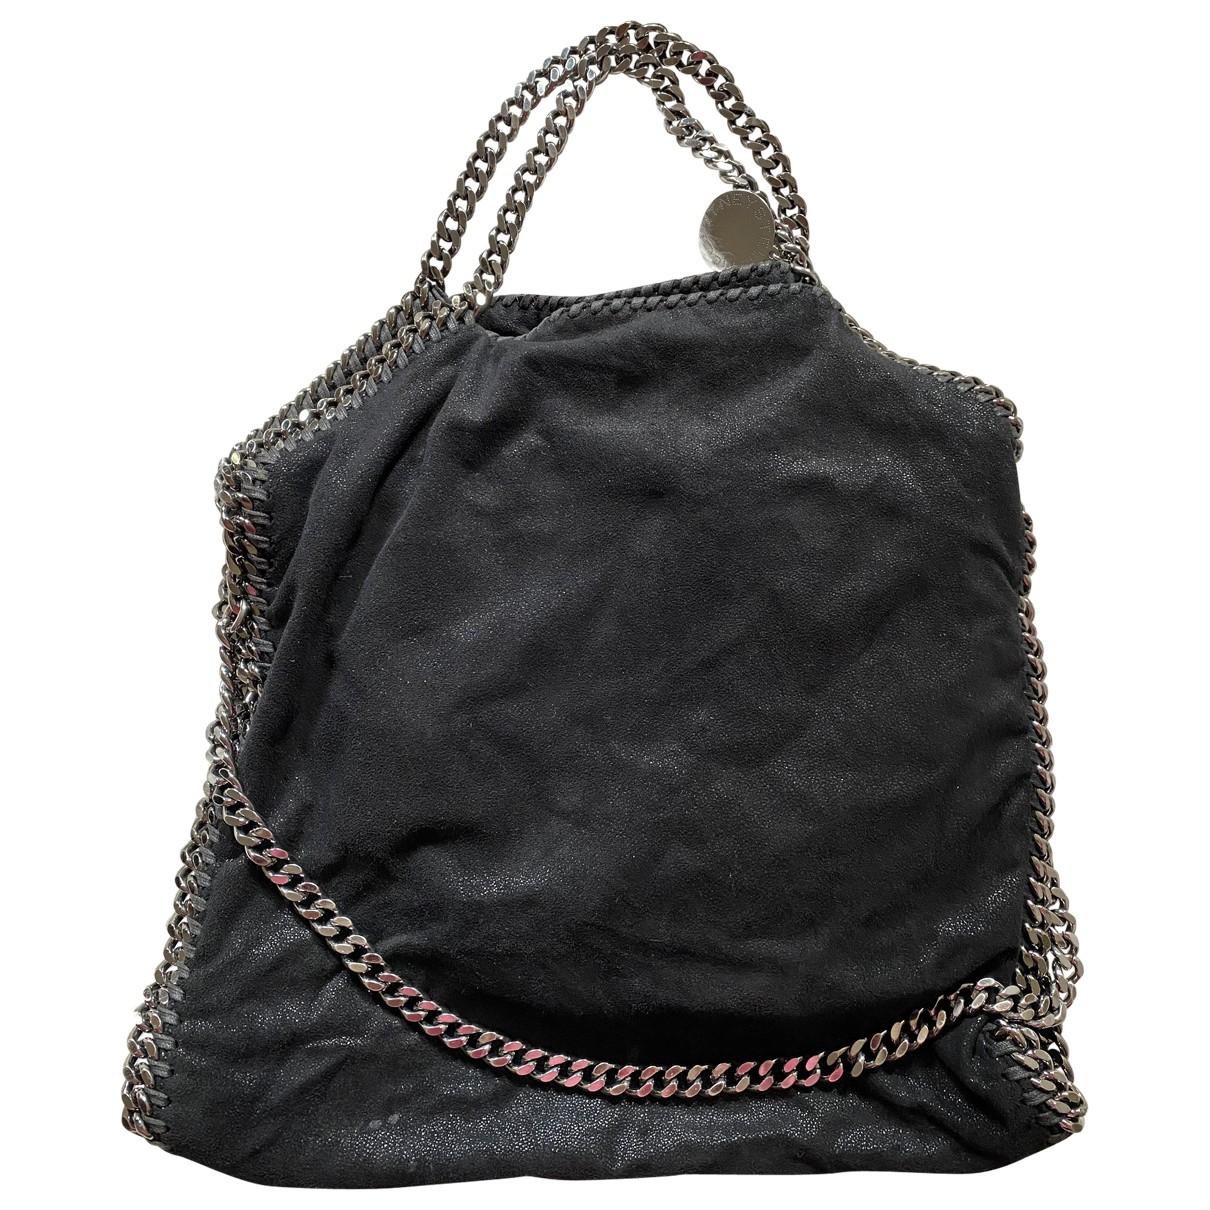 Stella Mccartney Falabella Black Cotton handbag for Women N